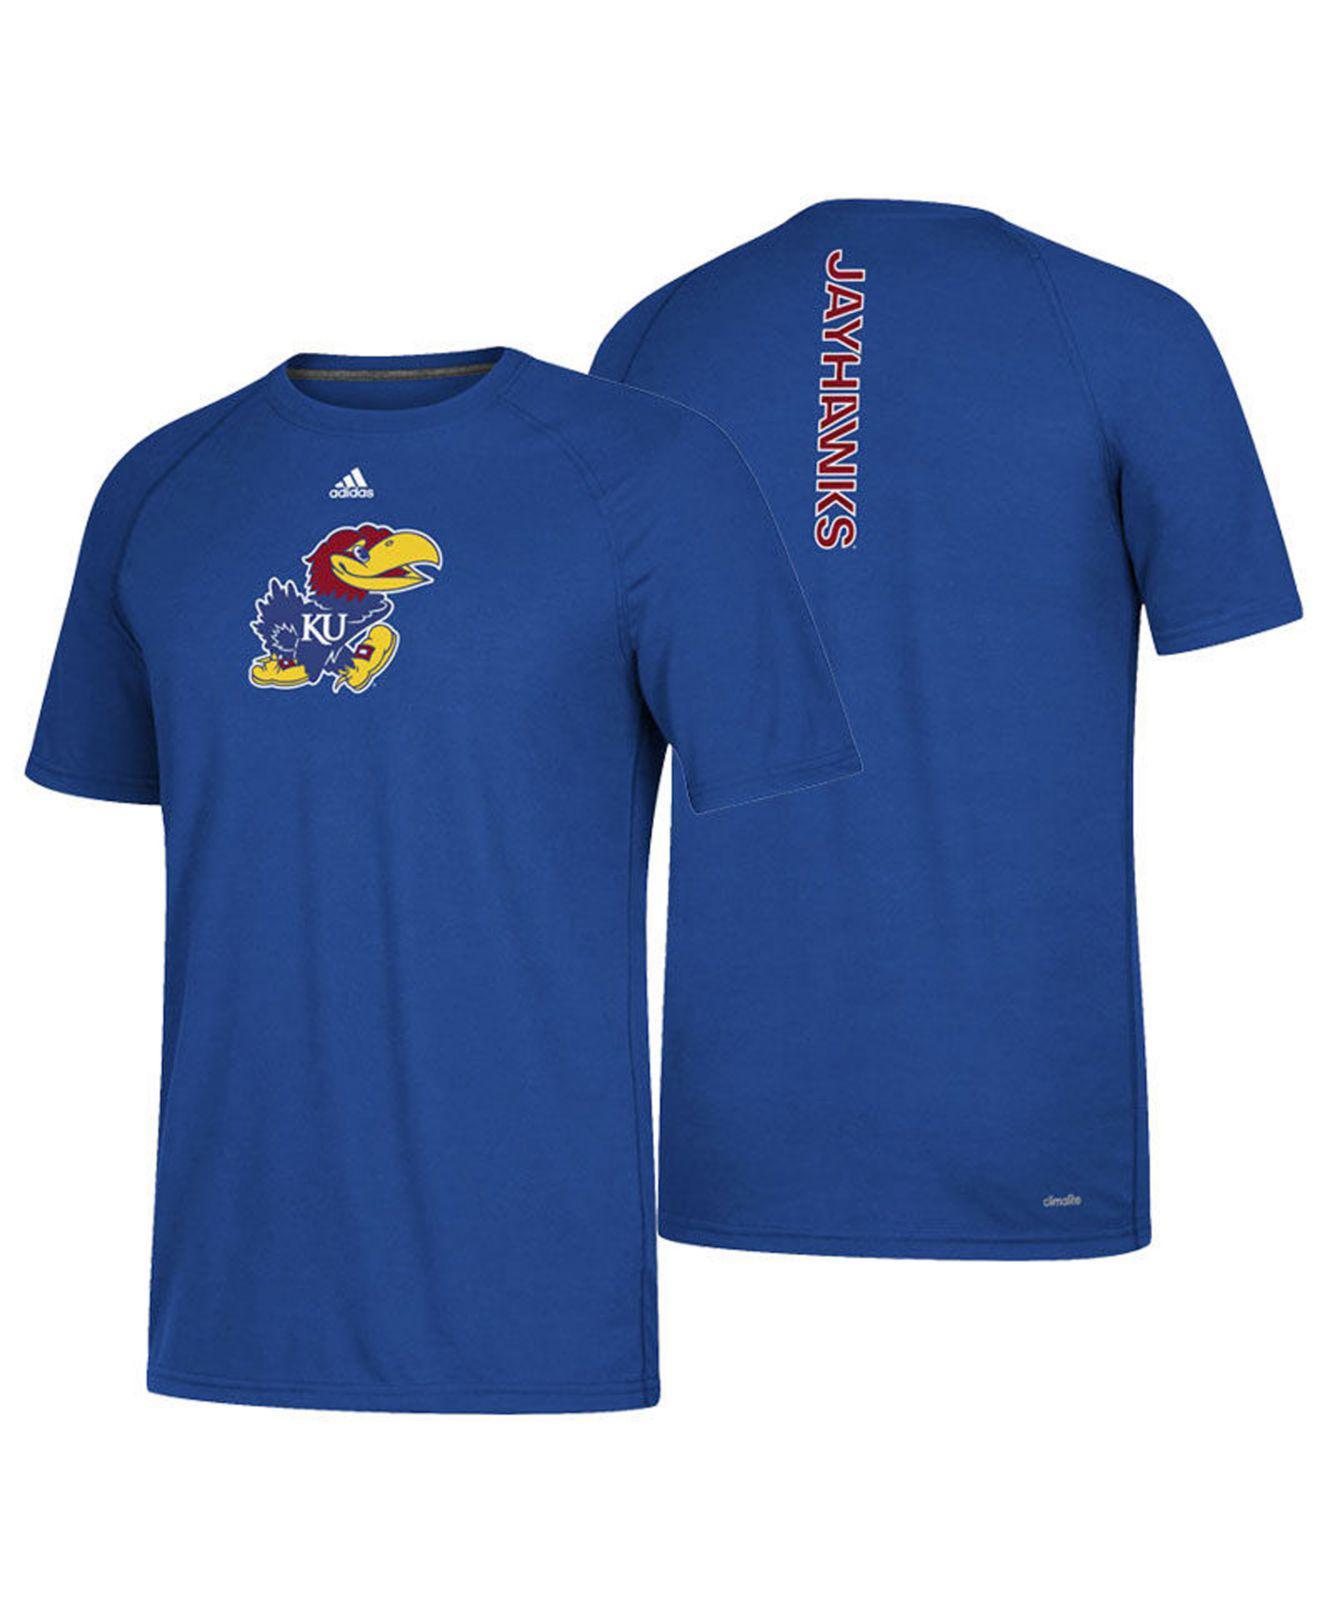 innovative design 226d6 2a1a9 adidas. Men s Blue Kansas Jayhawks Sideline Sequel T-shirt